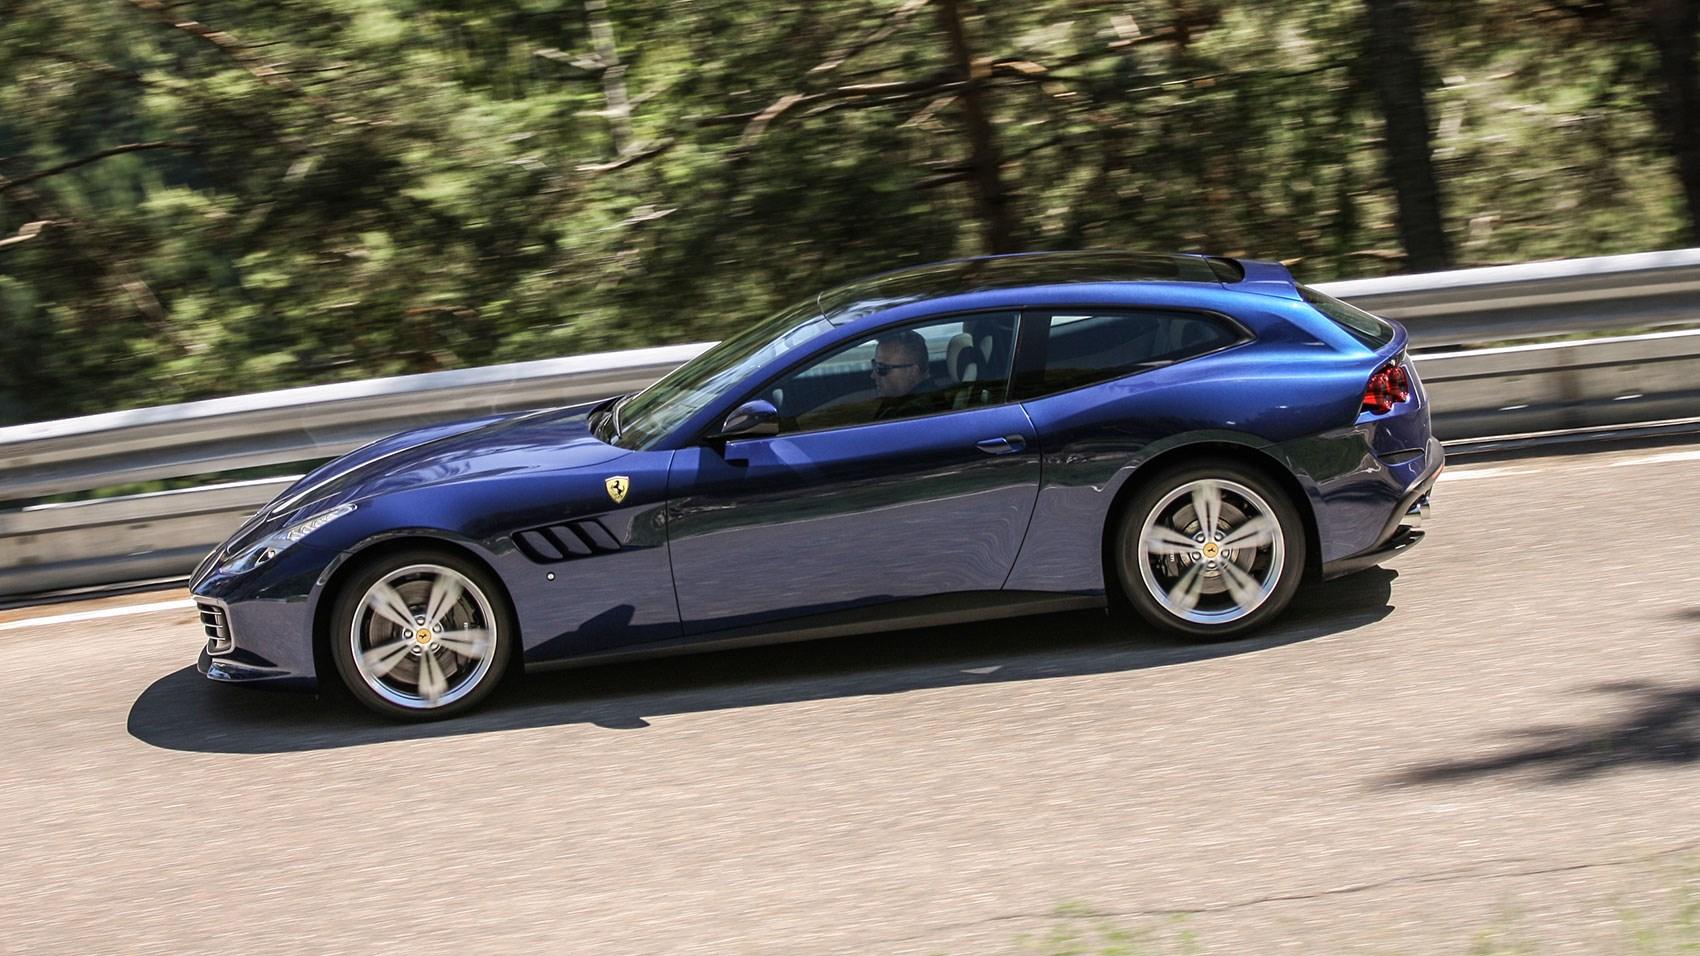 Ferrari F12 Top View >> Ferrari GTC4Lusso (2016) review | CAR Magazine